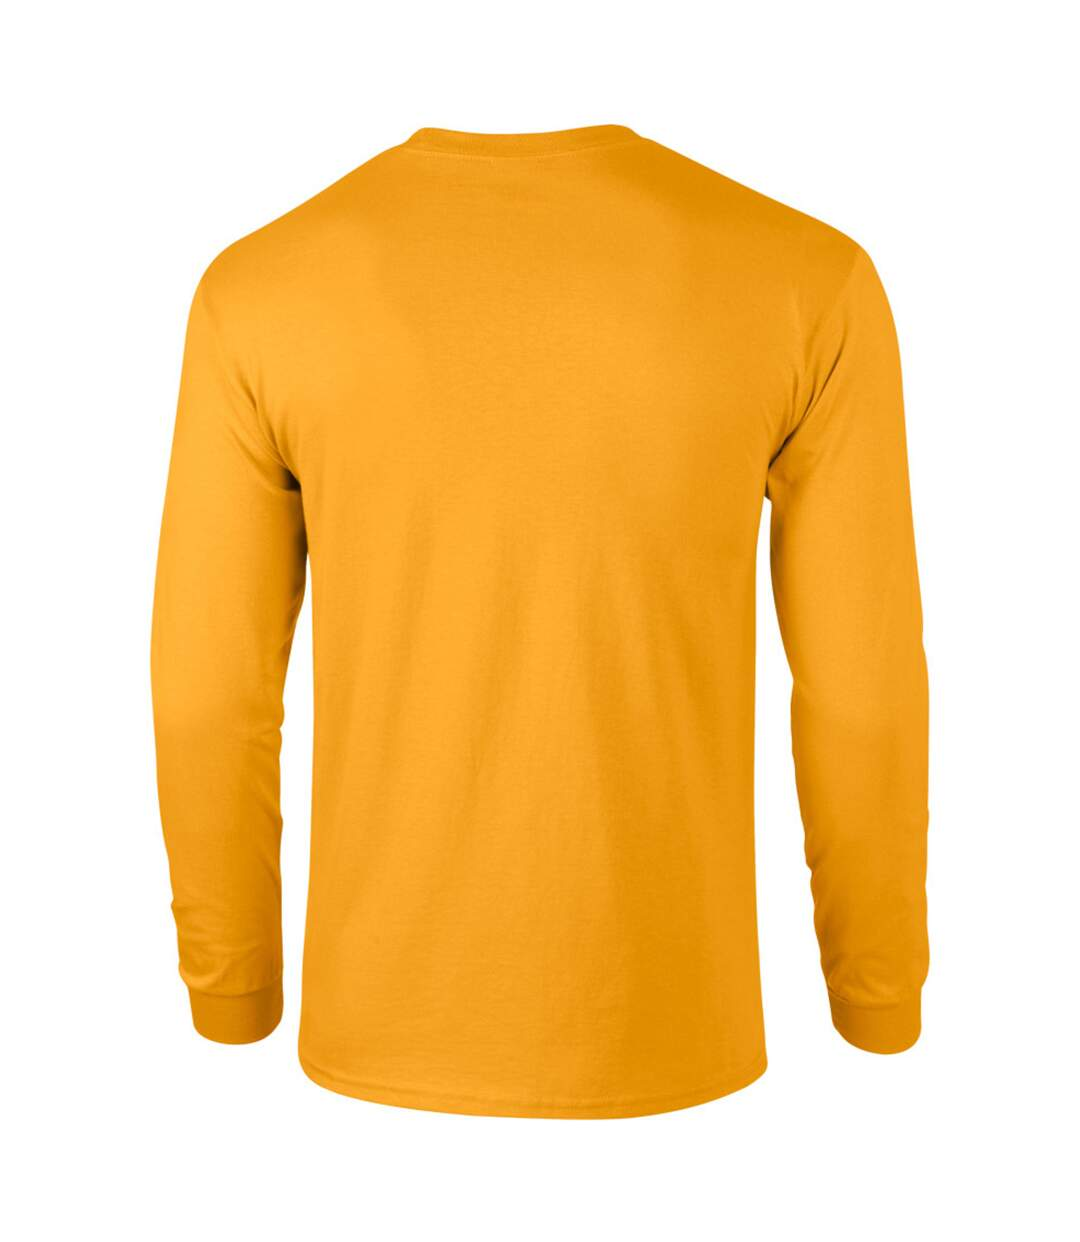 Gildan Mens Plain Crew Neck Ultra Cotton Long Sleeve T-Shirt (Safety Orange) - UTBC477